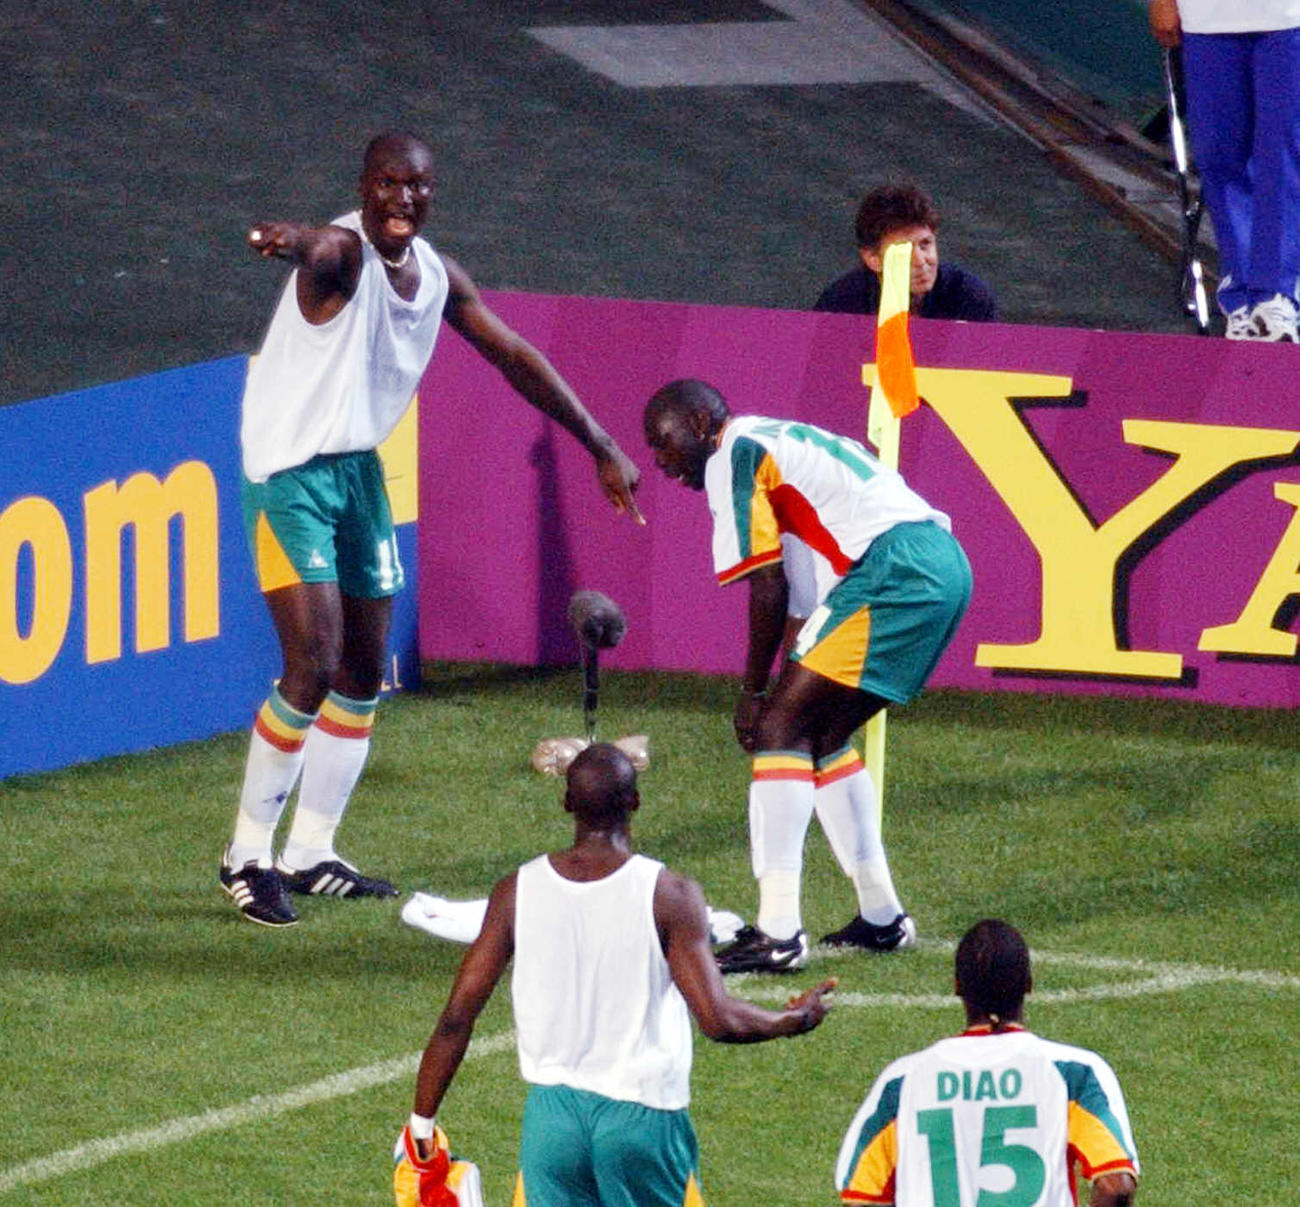 W杯日韓大会 フランス戦でブバ・ディオプ(左)が先制ゴールを挙げて大喜びのセネガルイレブン(2002年5月31日)